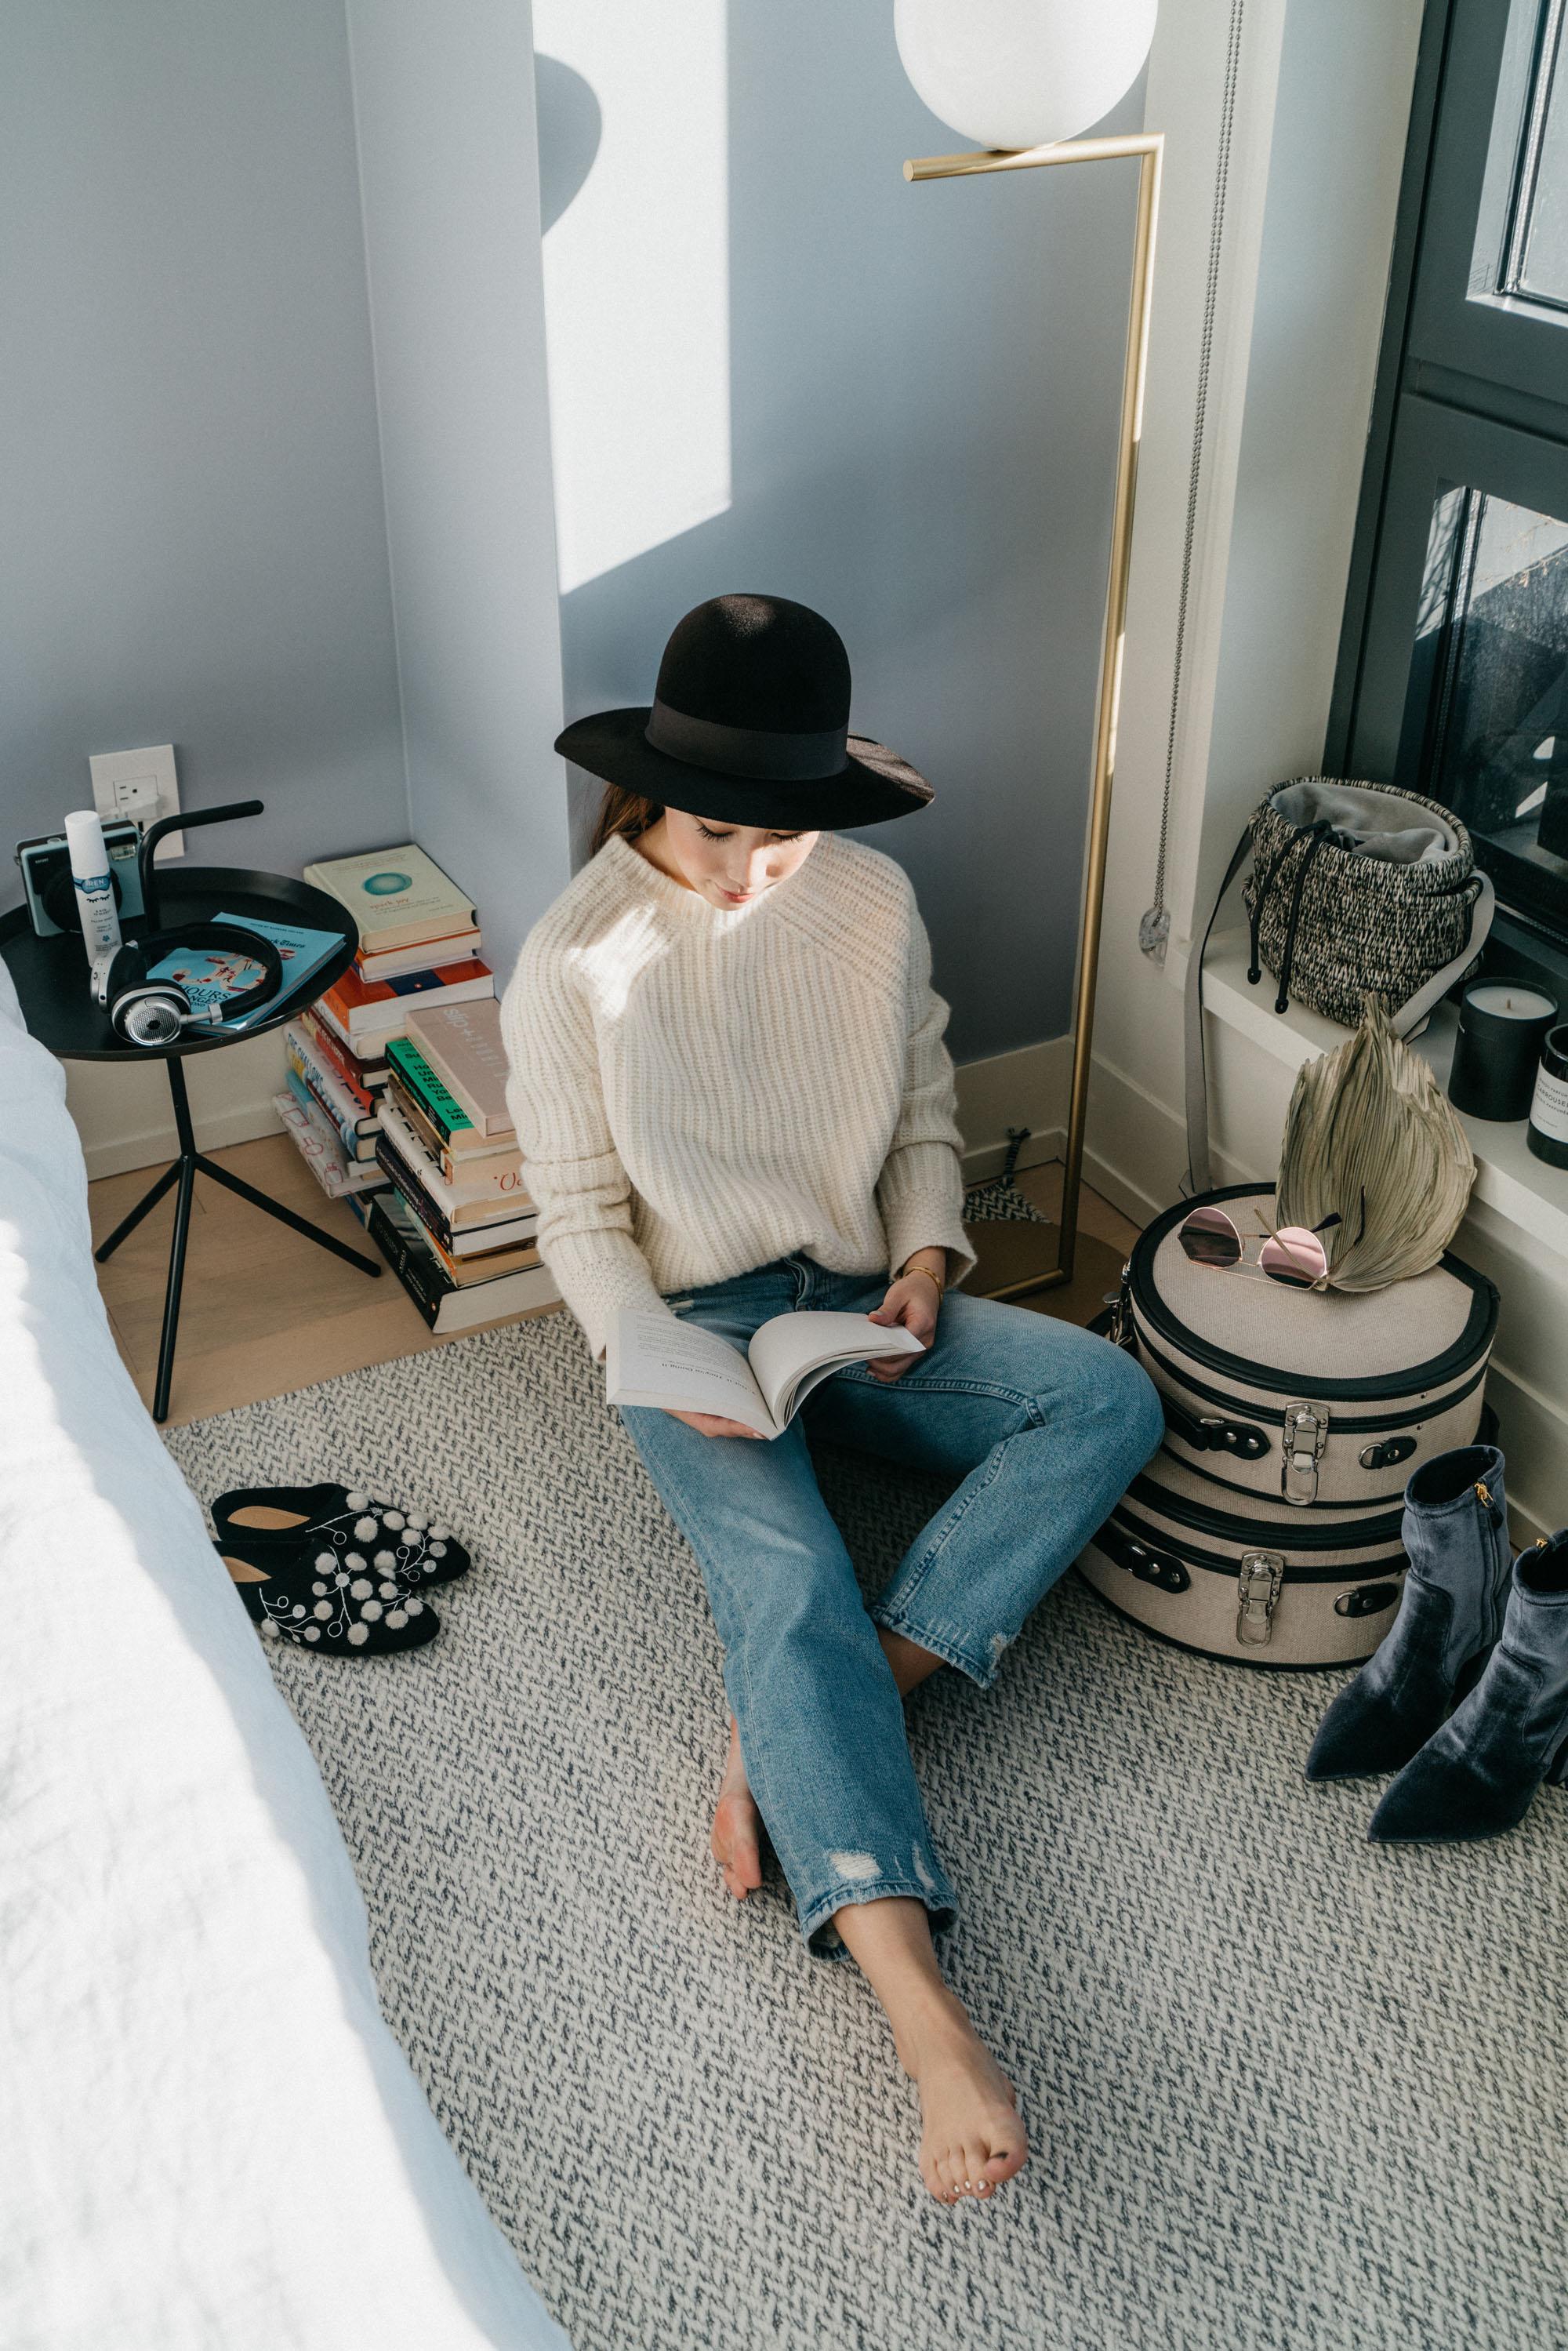 The Row Slippers , Nili Lotan Sweater,  Mother Denim , Saint Laurent Hat,  Fendi Sunglasses ,  Steamline Luggage , Prada Boots